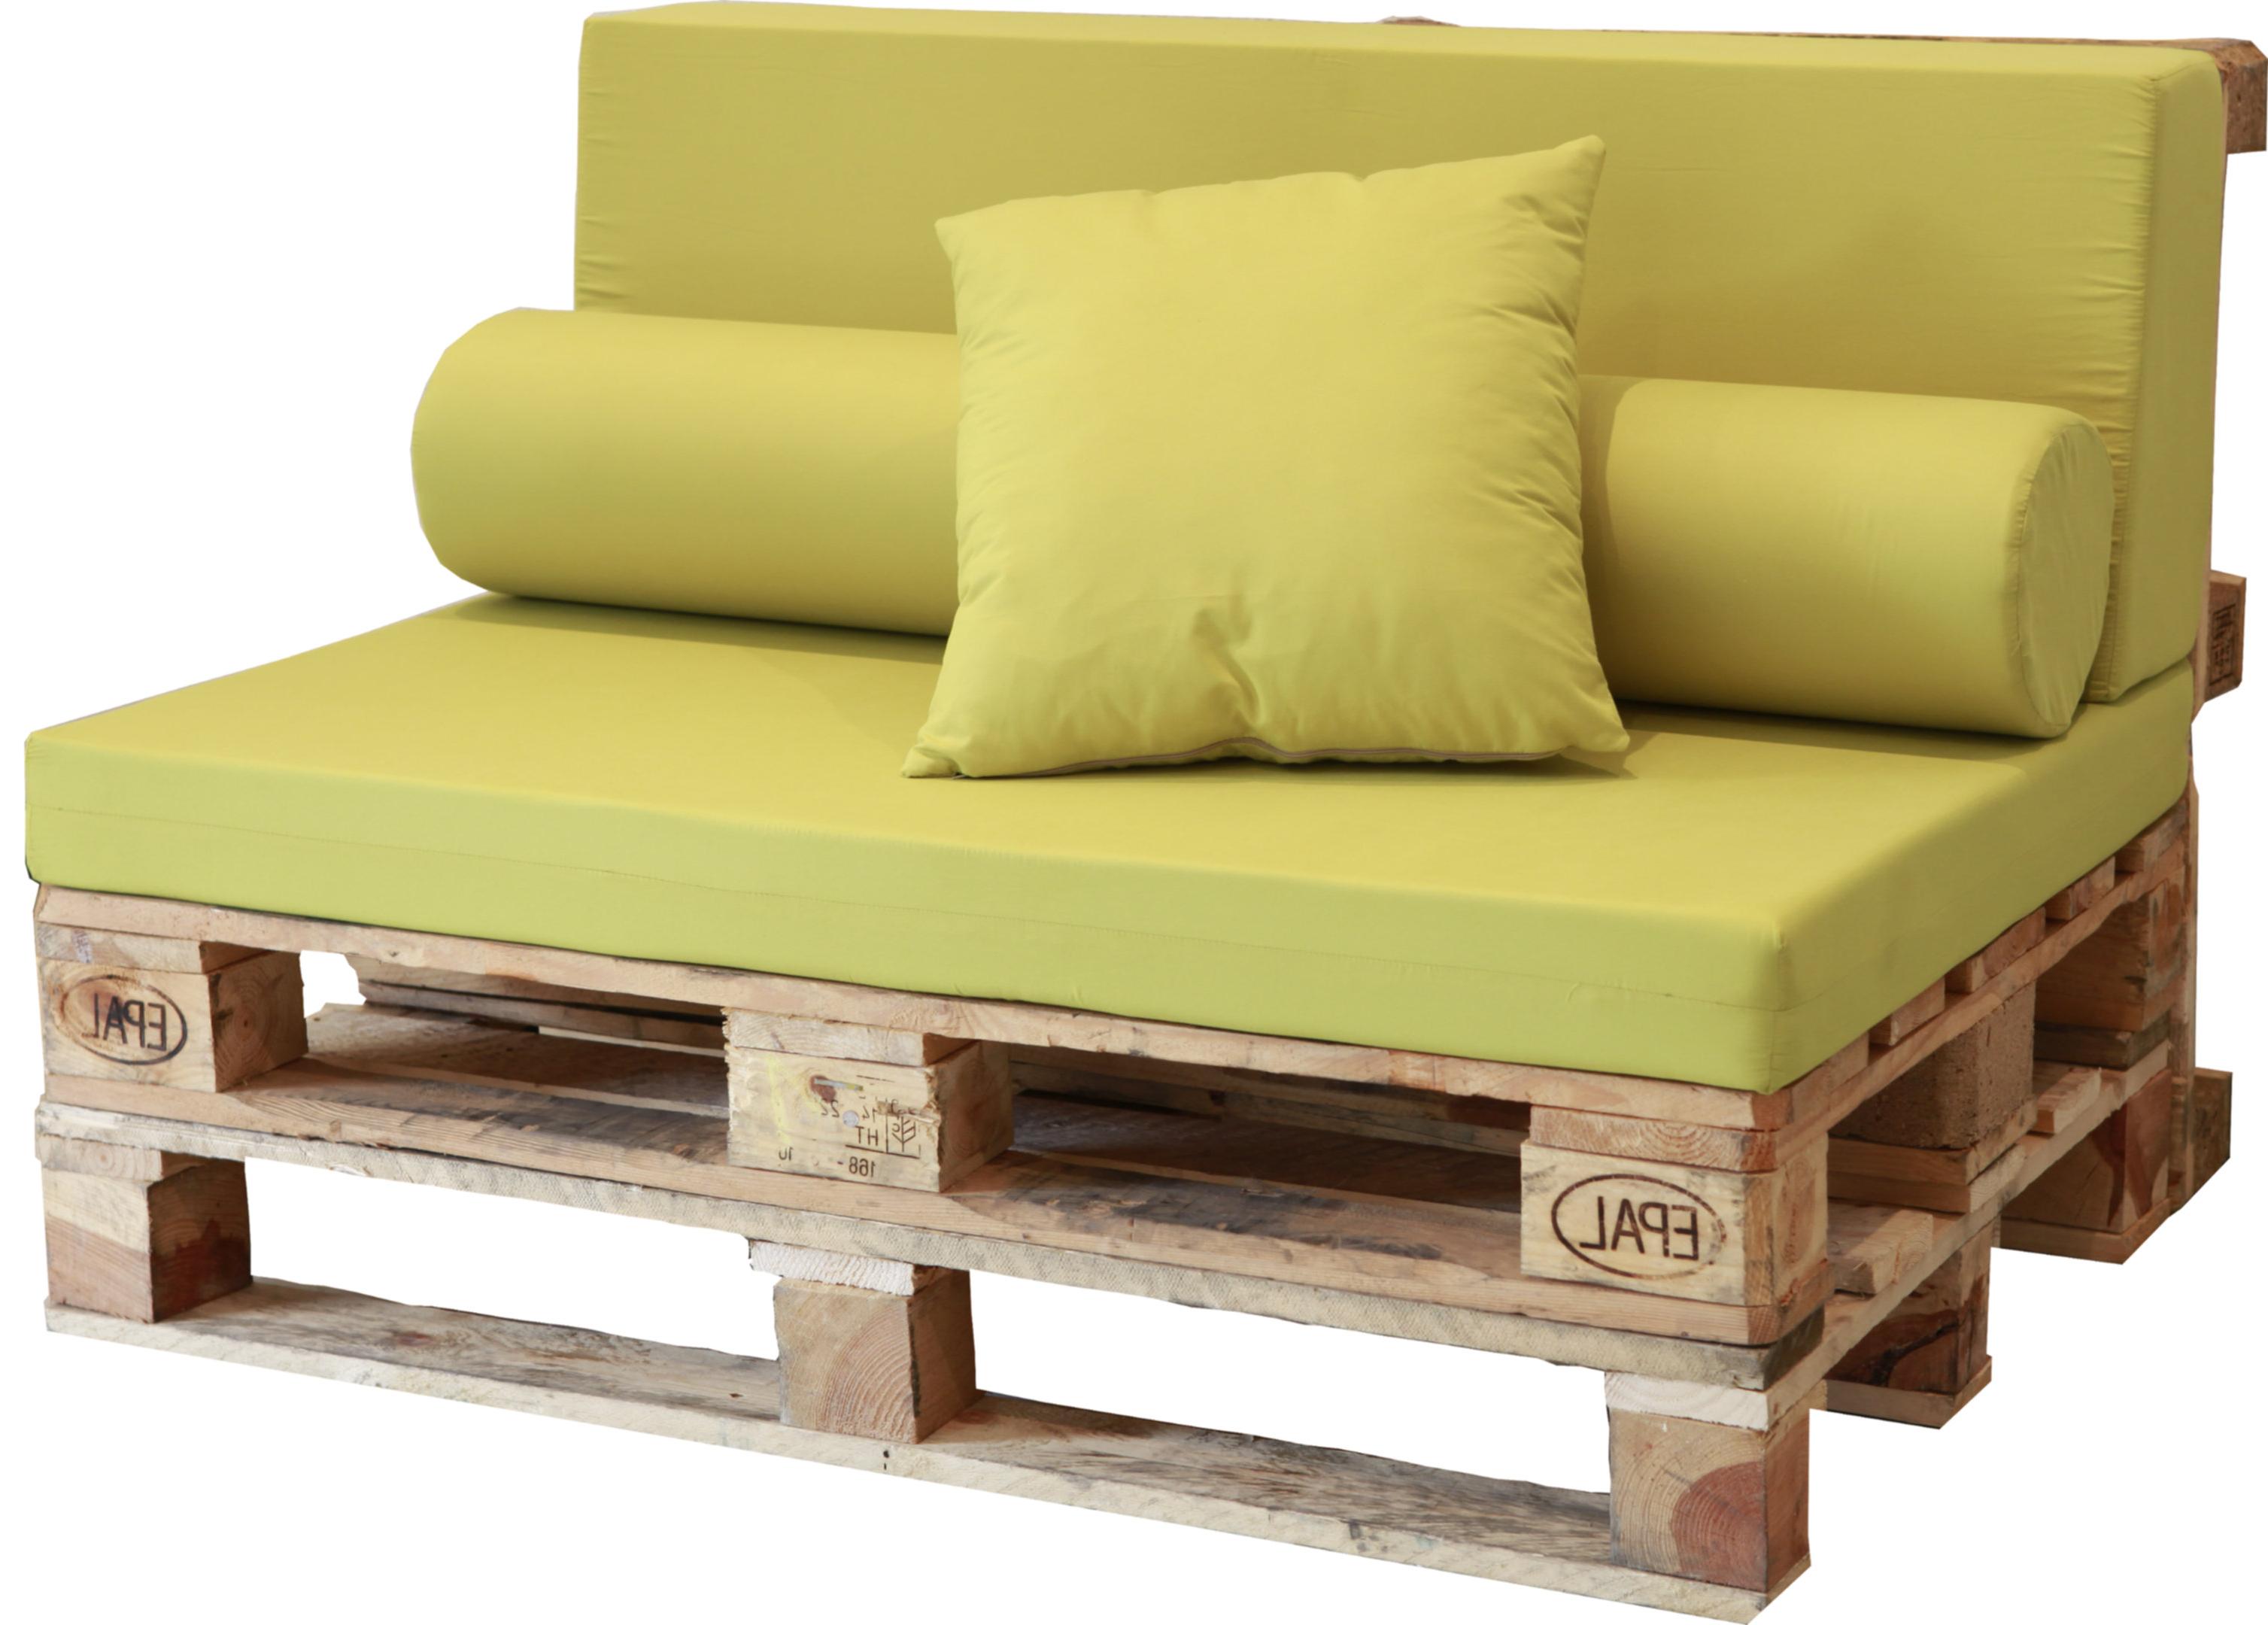 Sofa Cama Con Palets Wddj sofà Palet Europeo Microfibra